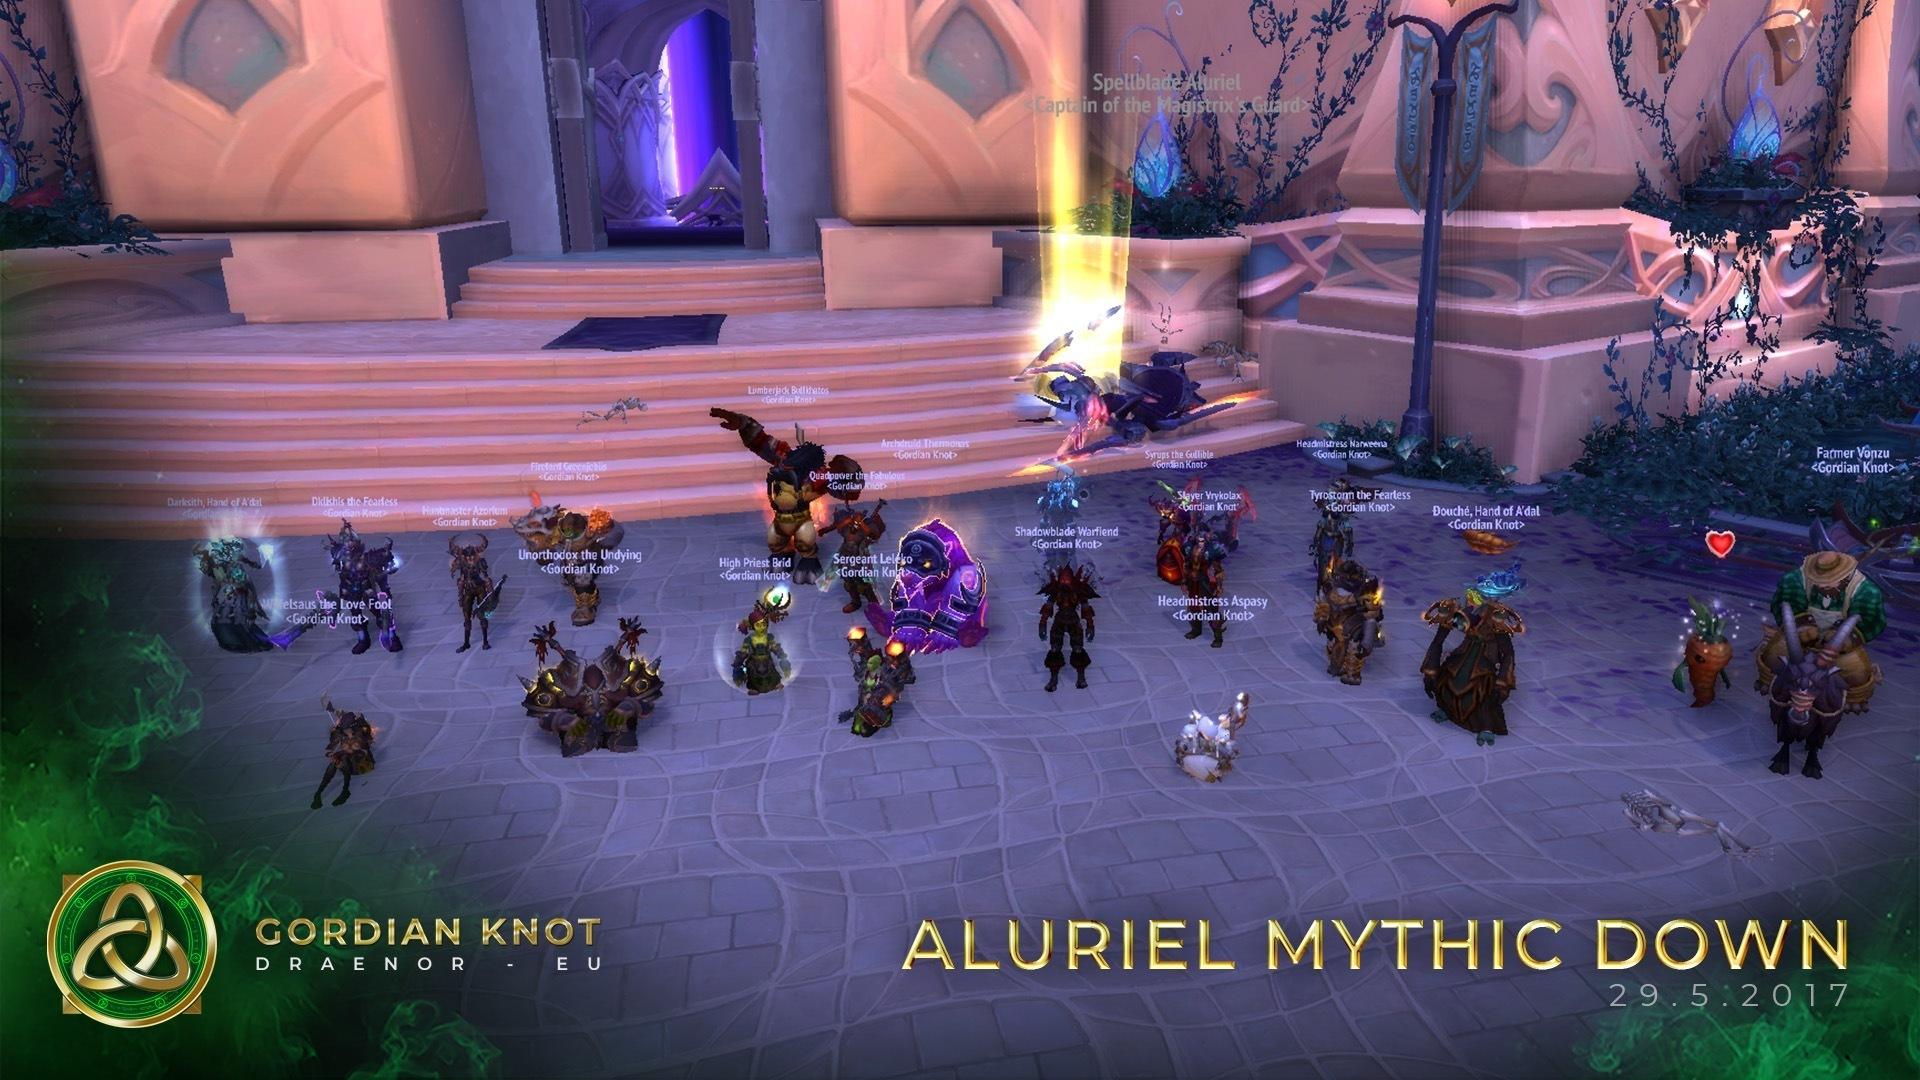 Aluriel Mythic